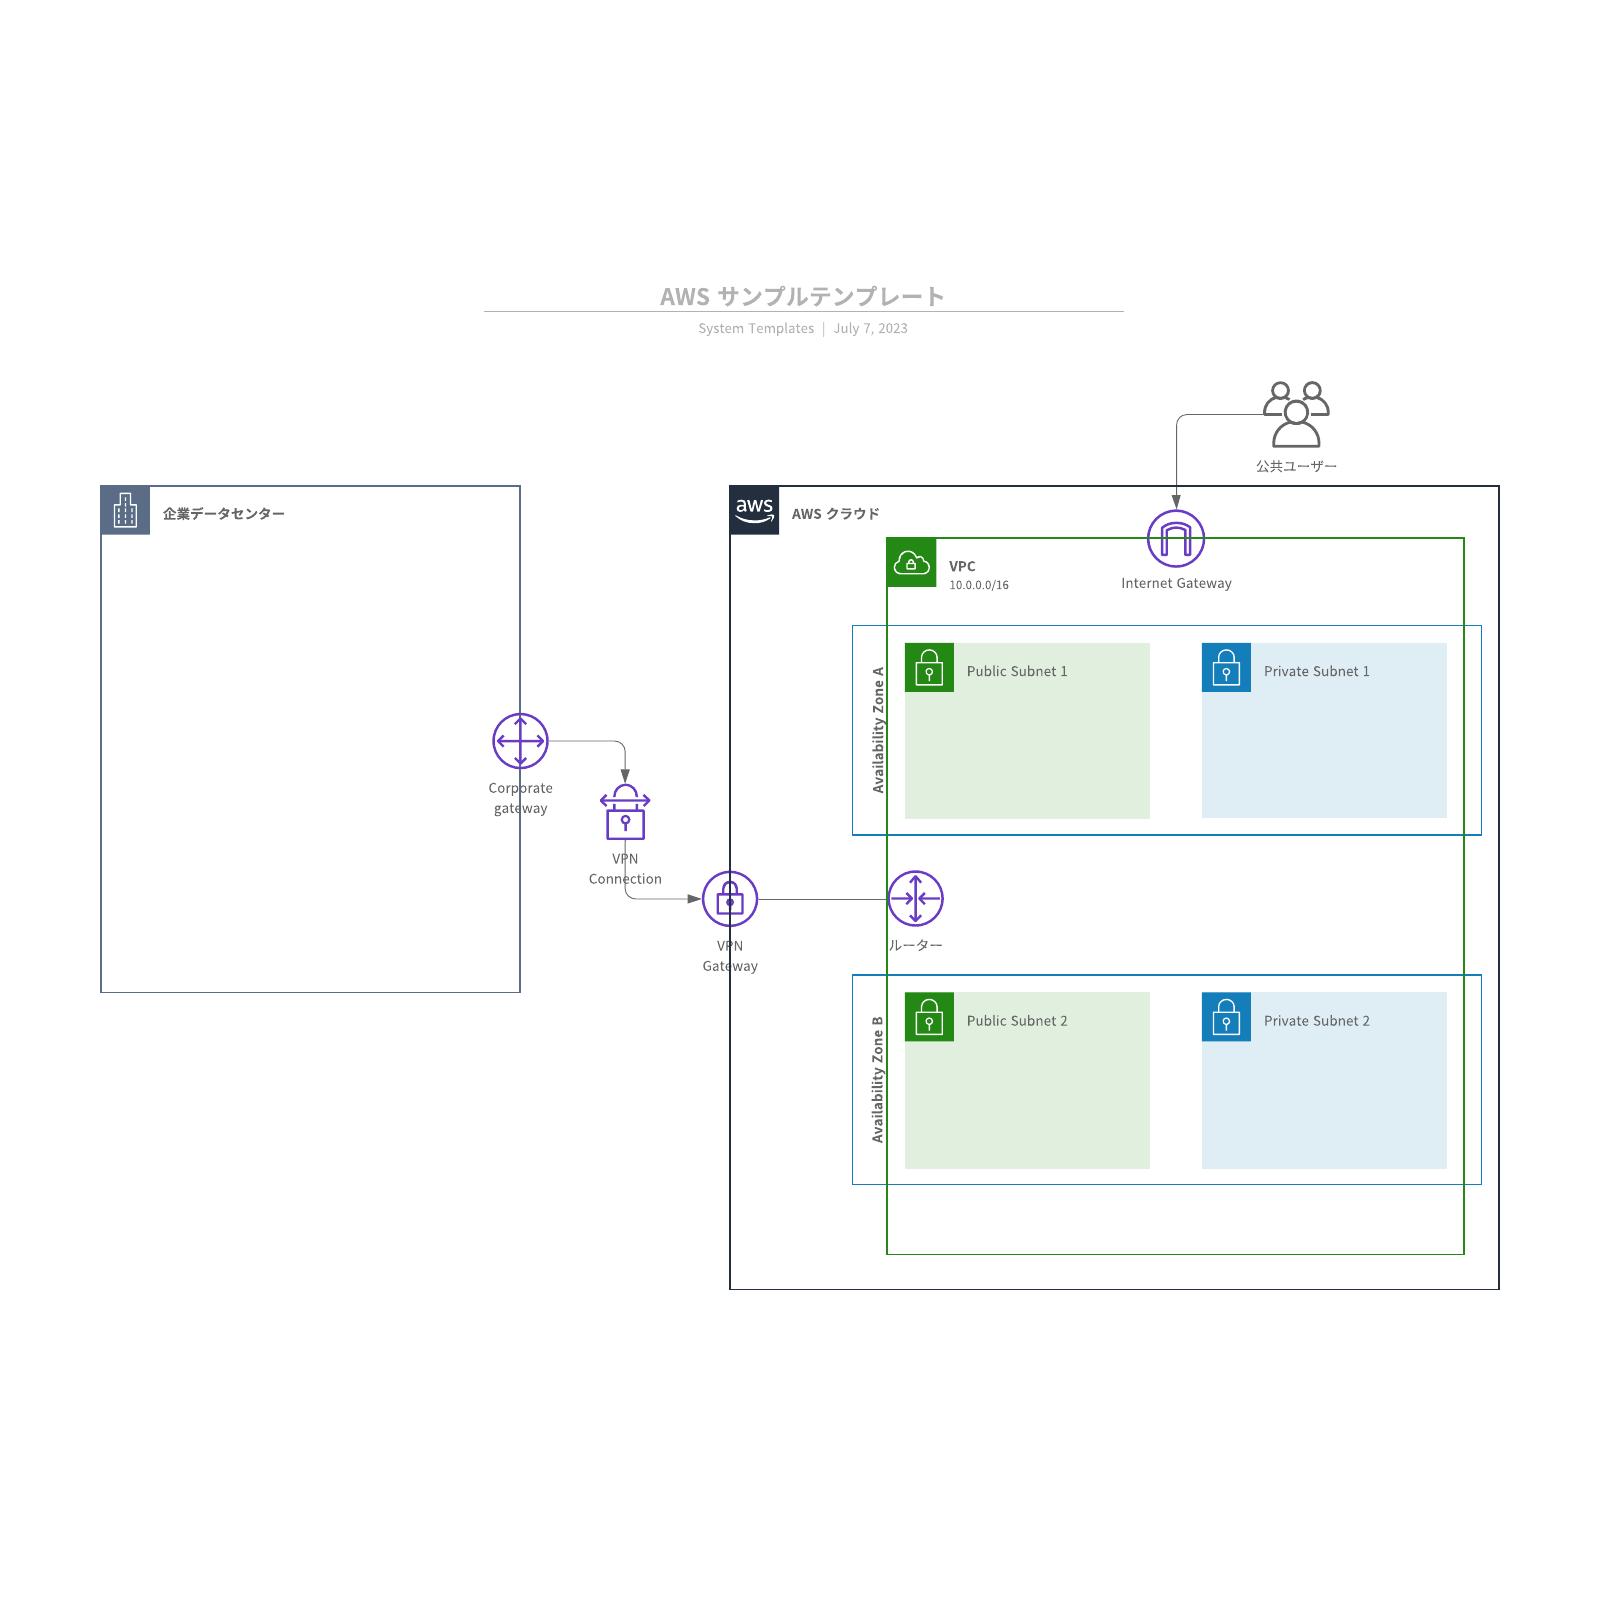 AWS構成図を表したサンプルテンプレート